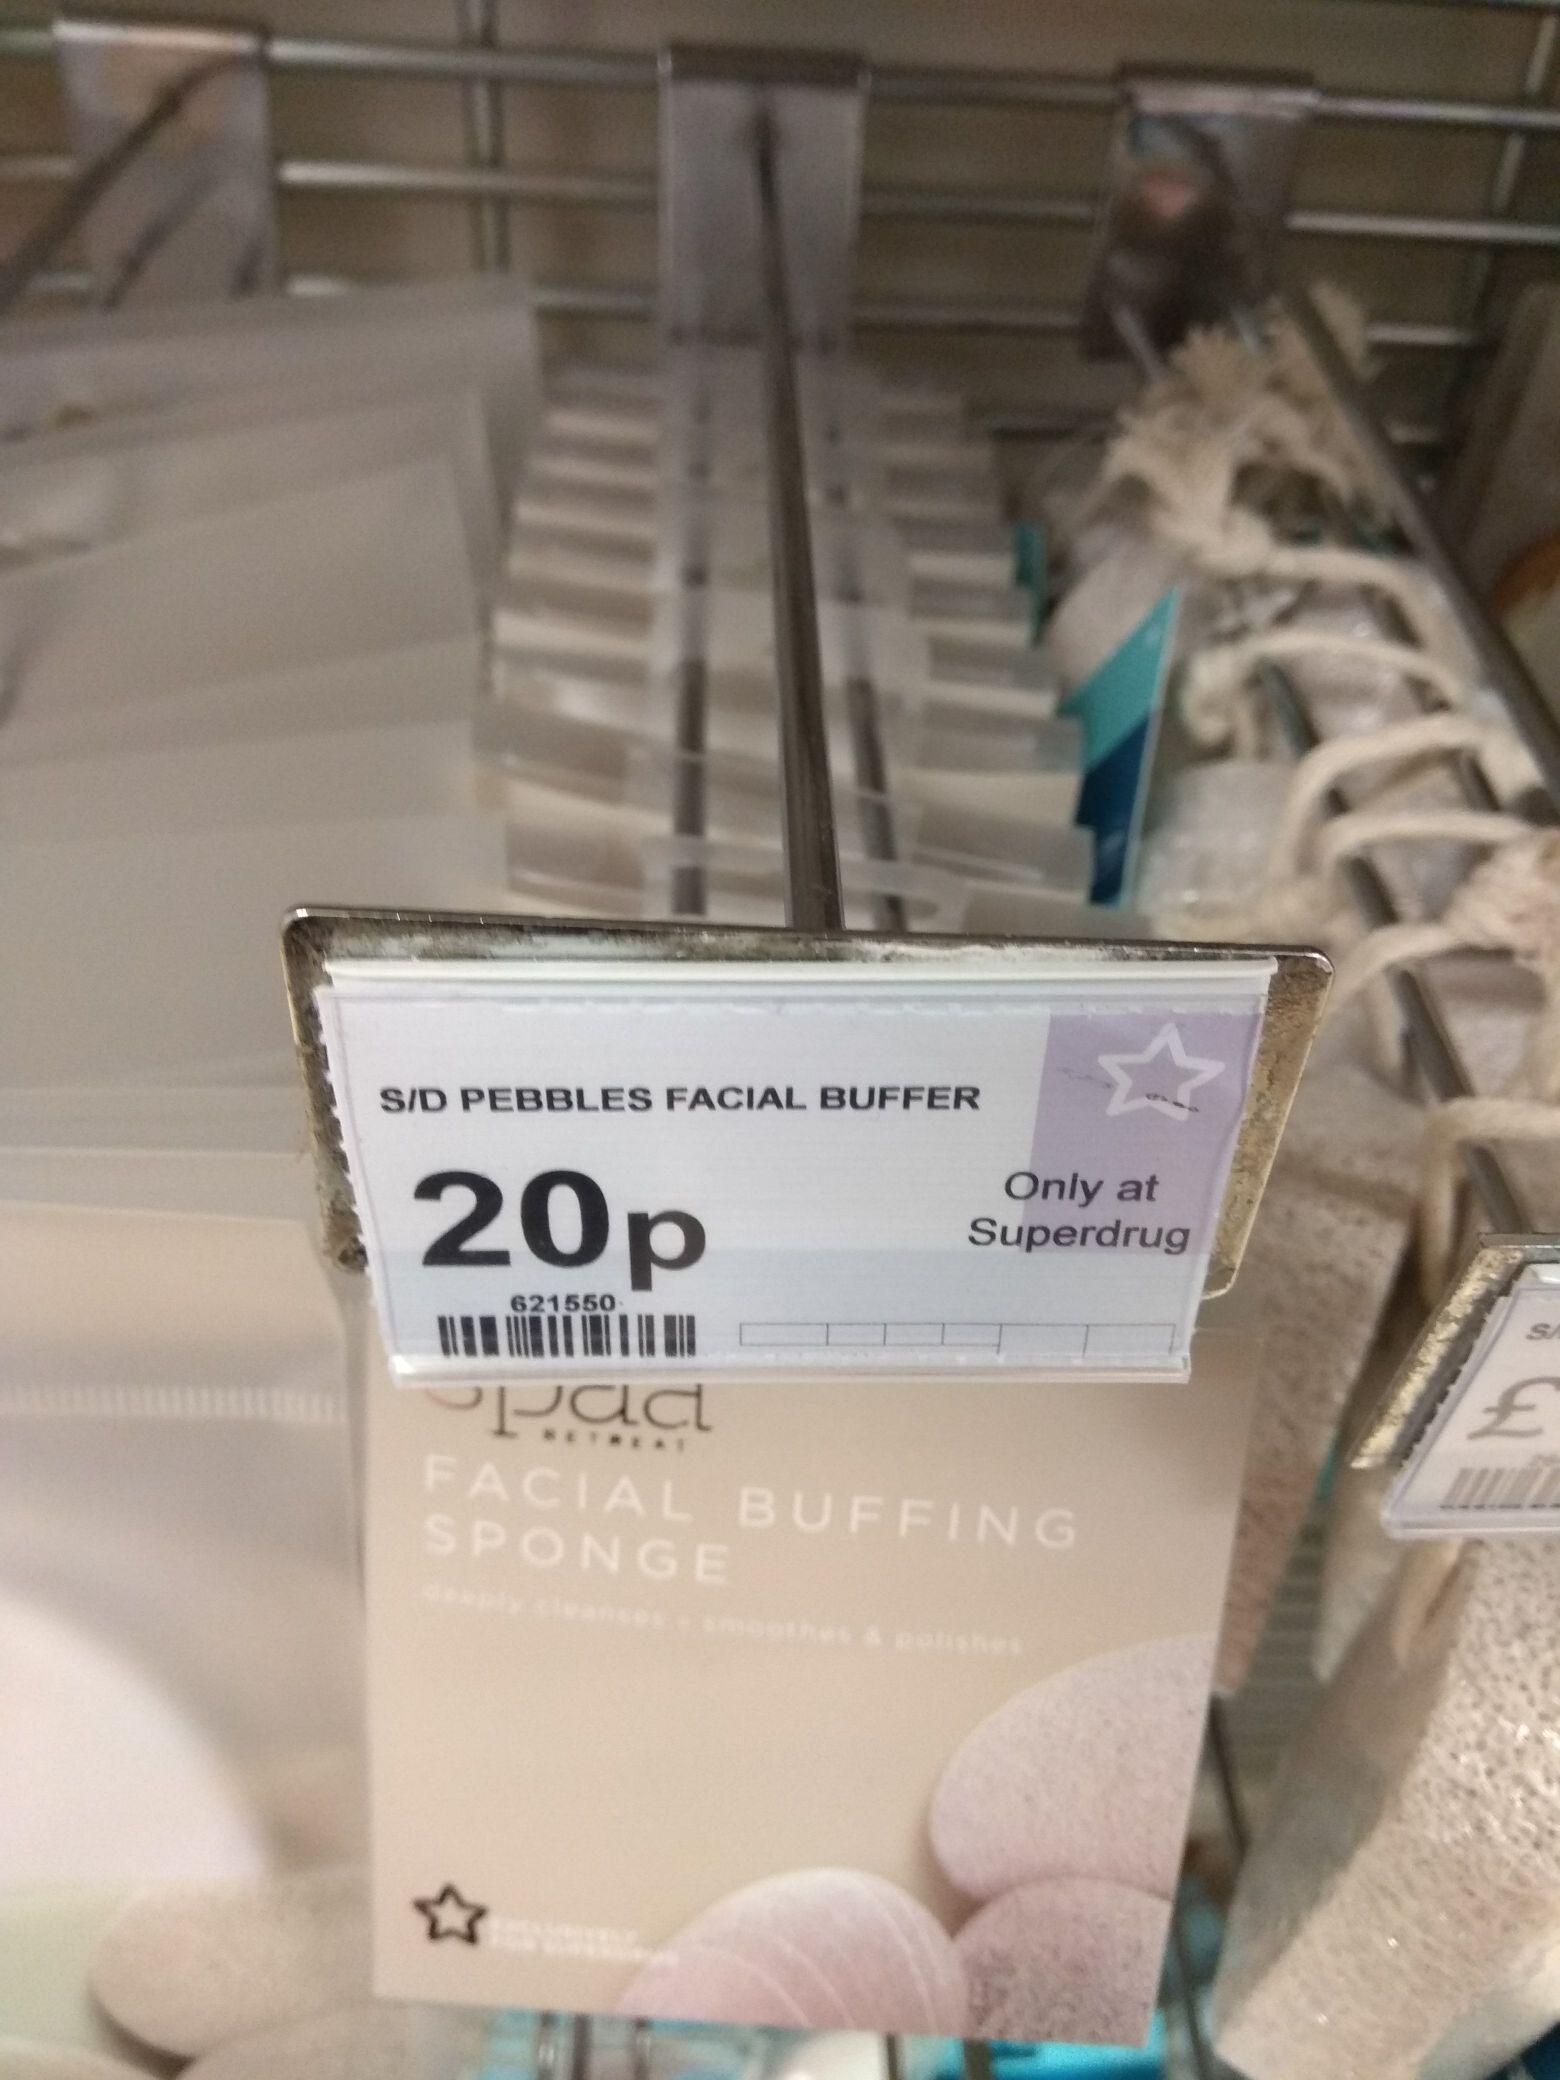 Spaa facial buffing sponge RRP £1.99 - 20p @ Superdrug